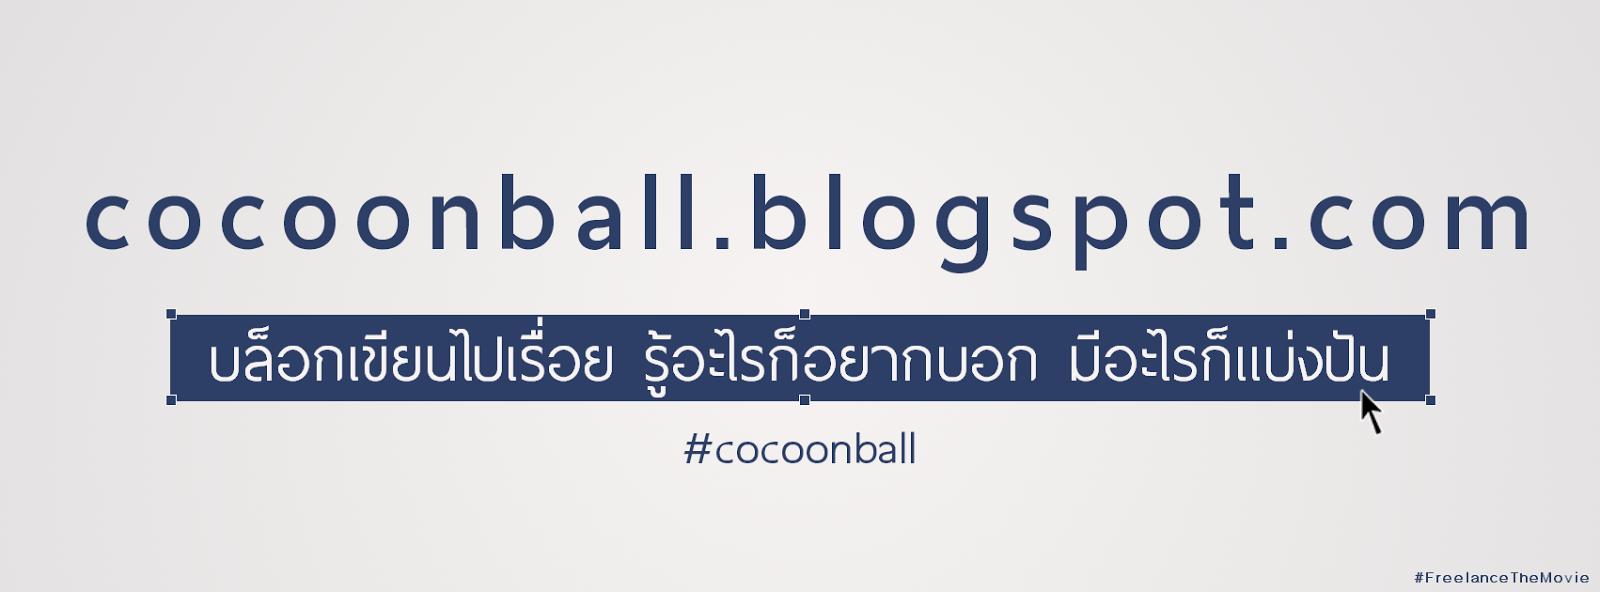 Cocoonball